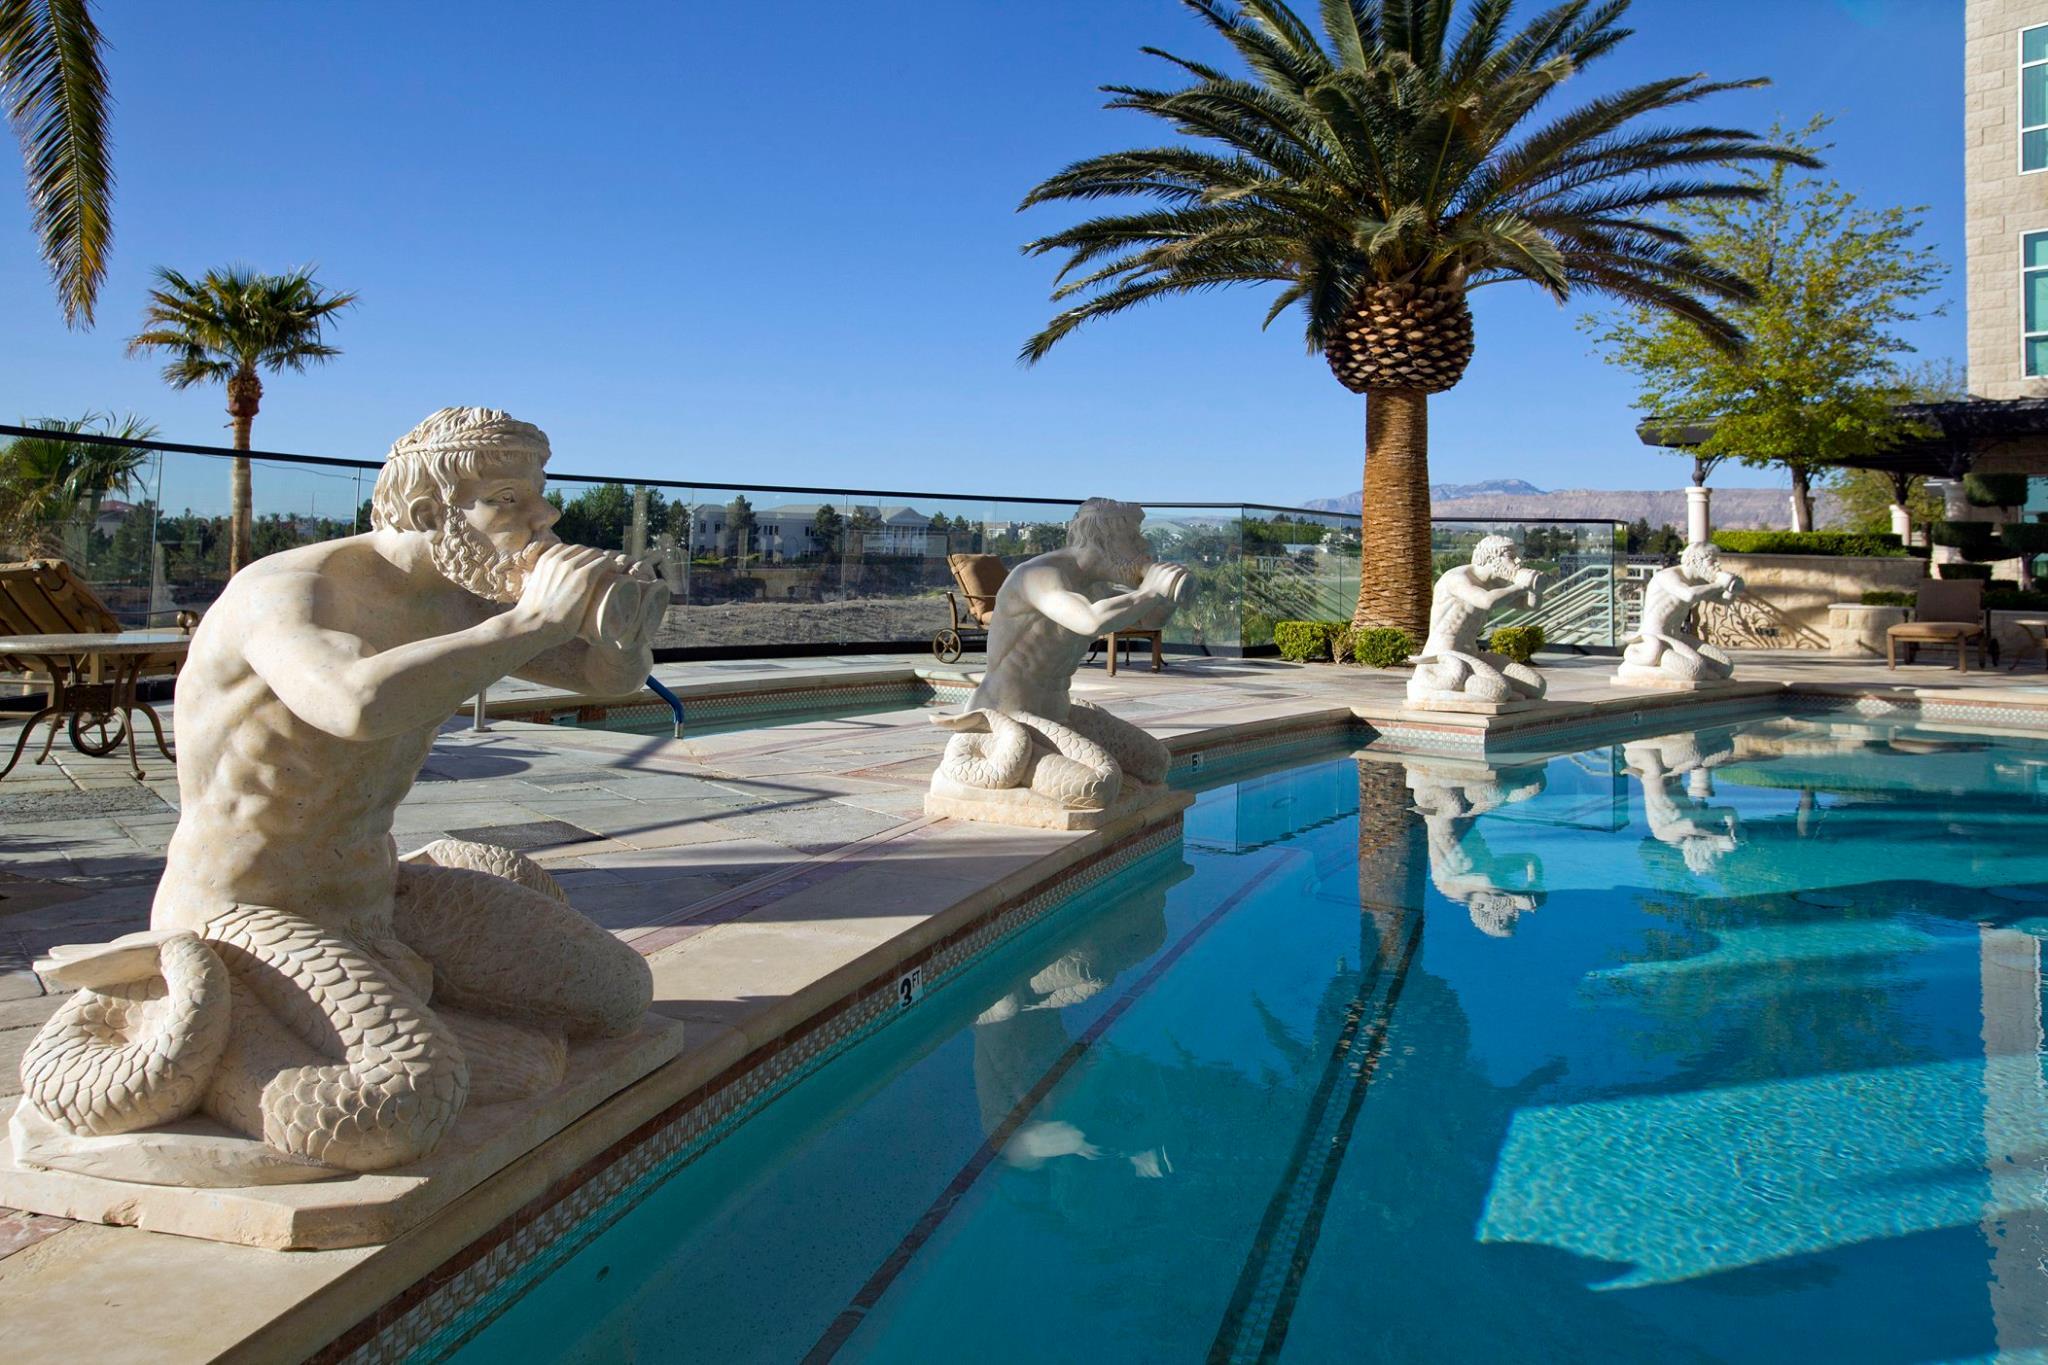 Summerlin Luxury High Rise Condos